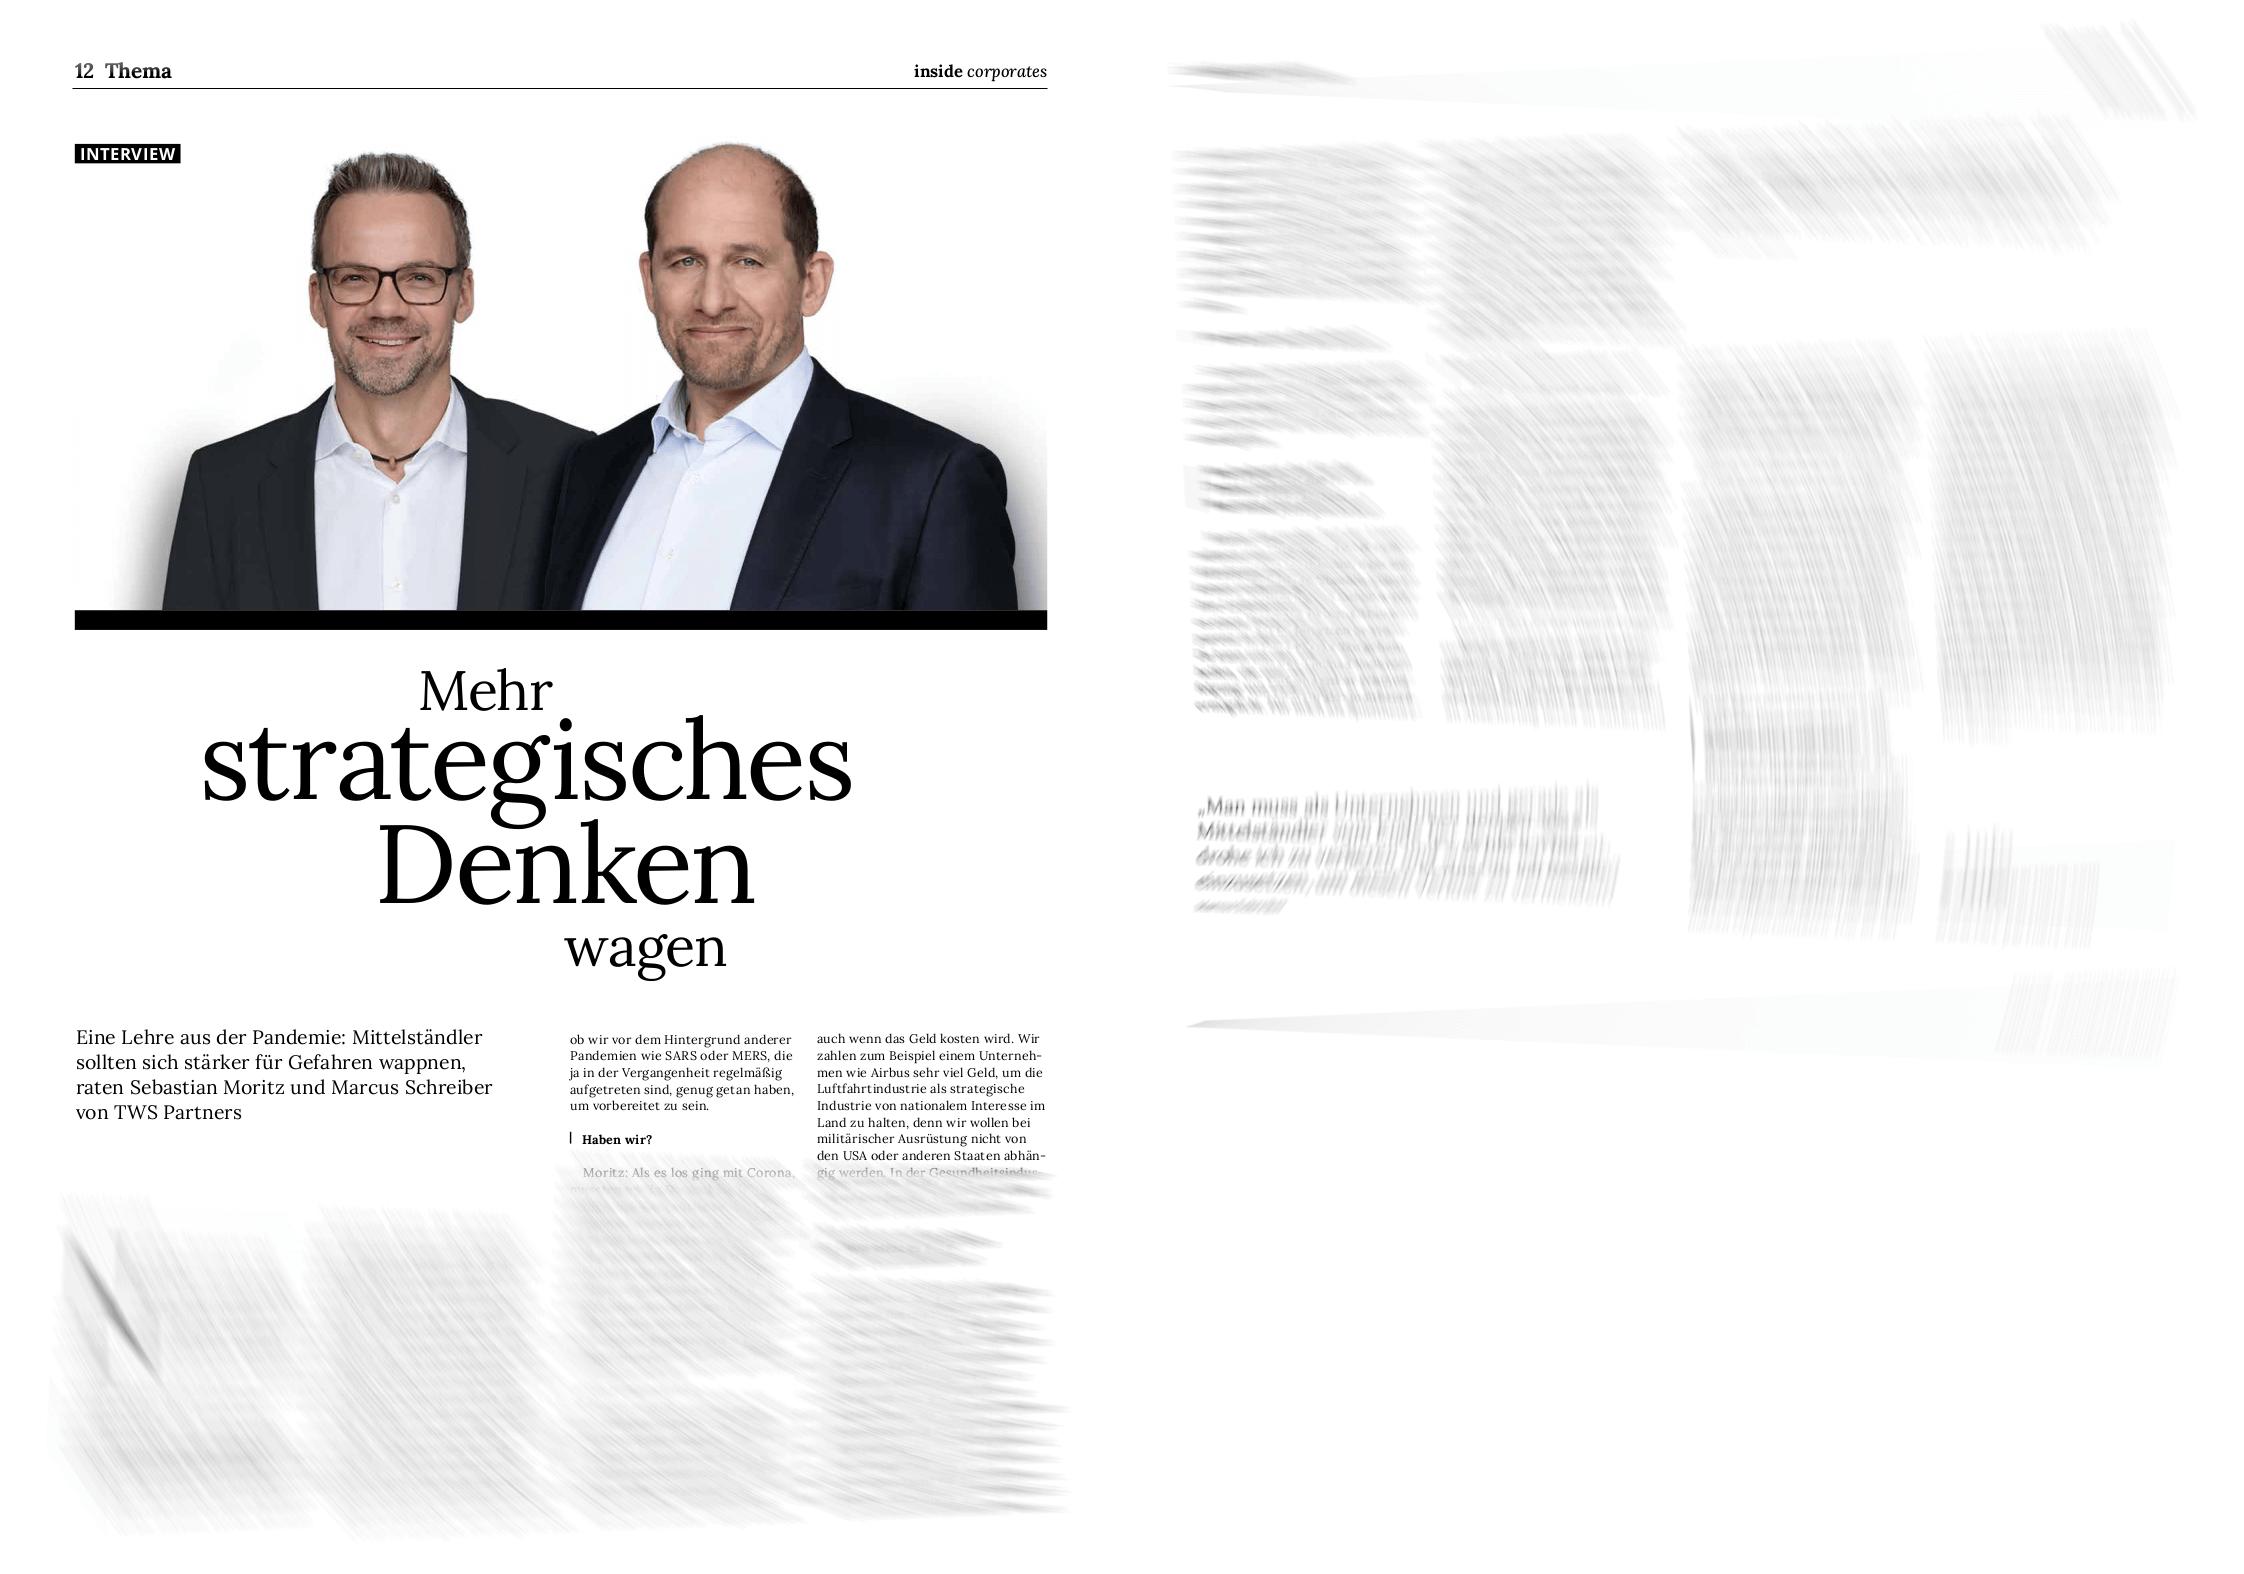 Deutscher Mittelstand TWS Partners inside corporates